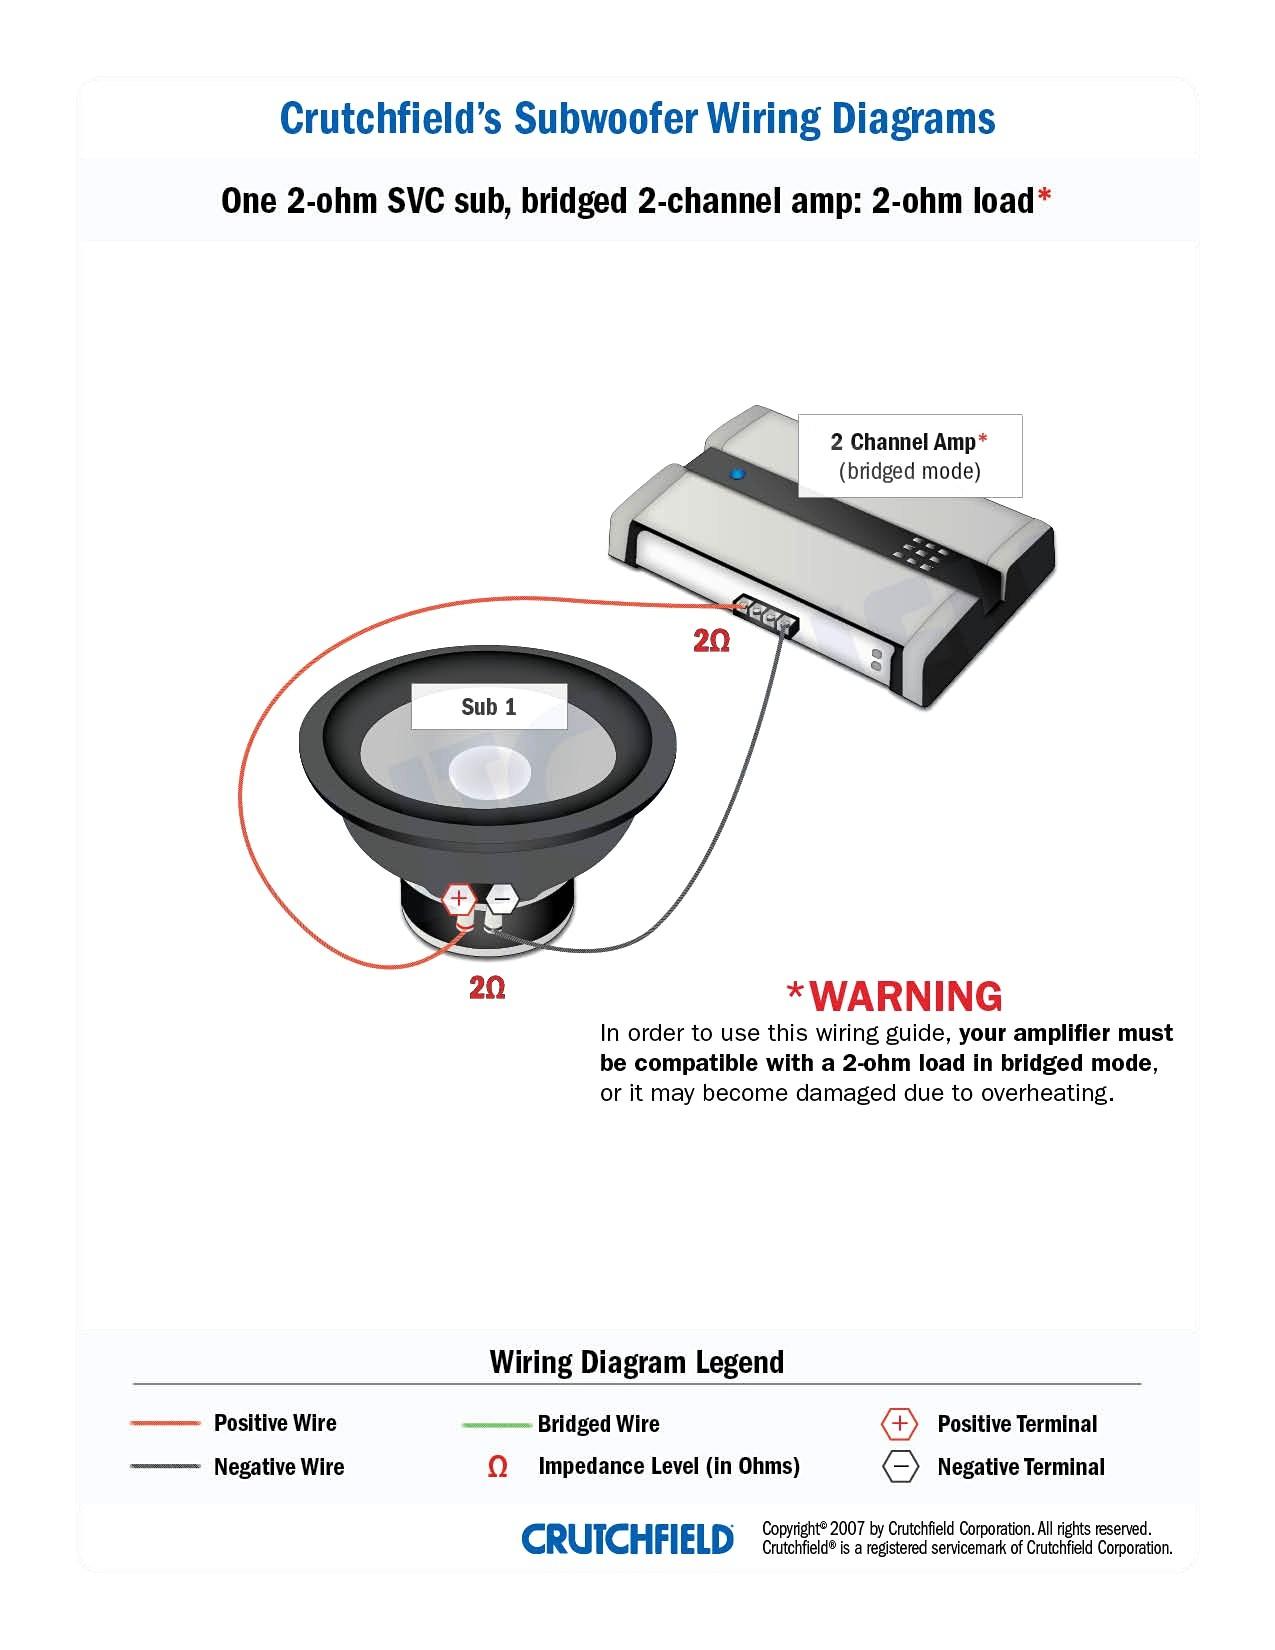 Kicker 11 L3 Wiring Diagram | Wiring Diagram - Kicker Amp Wiring Diagram